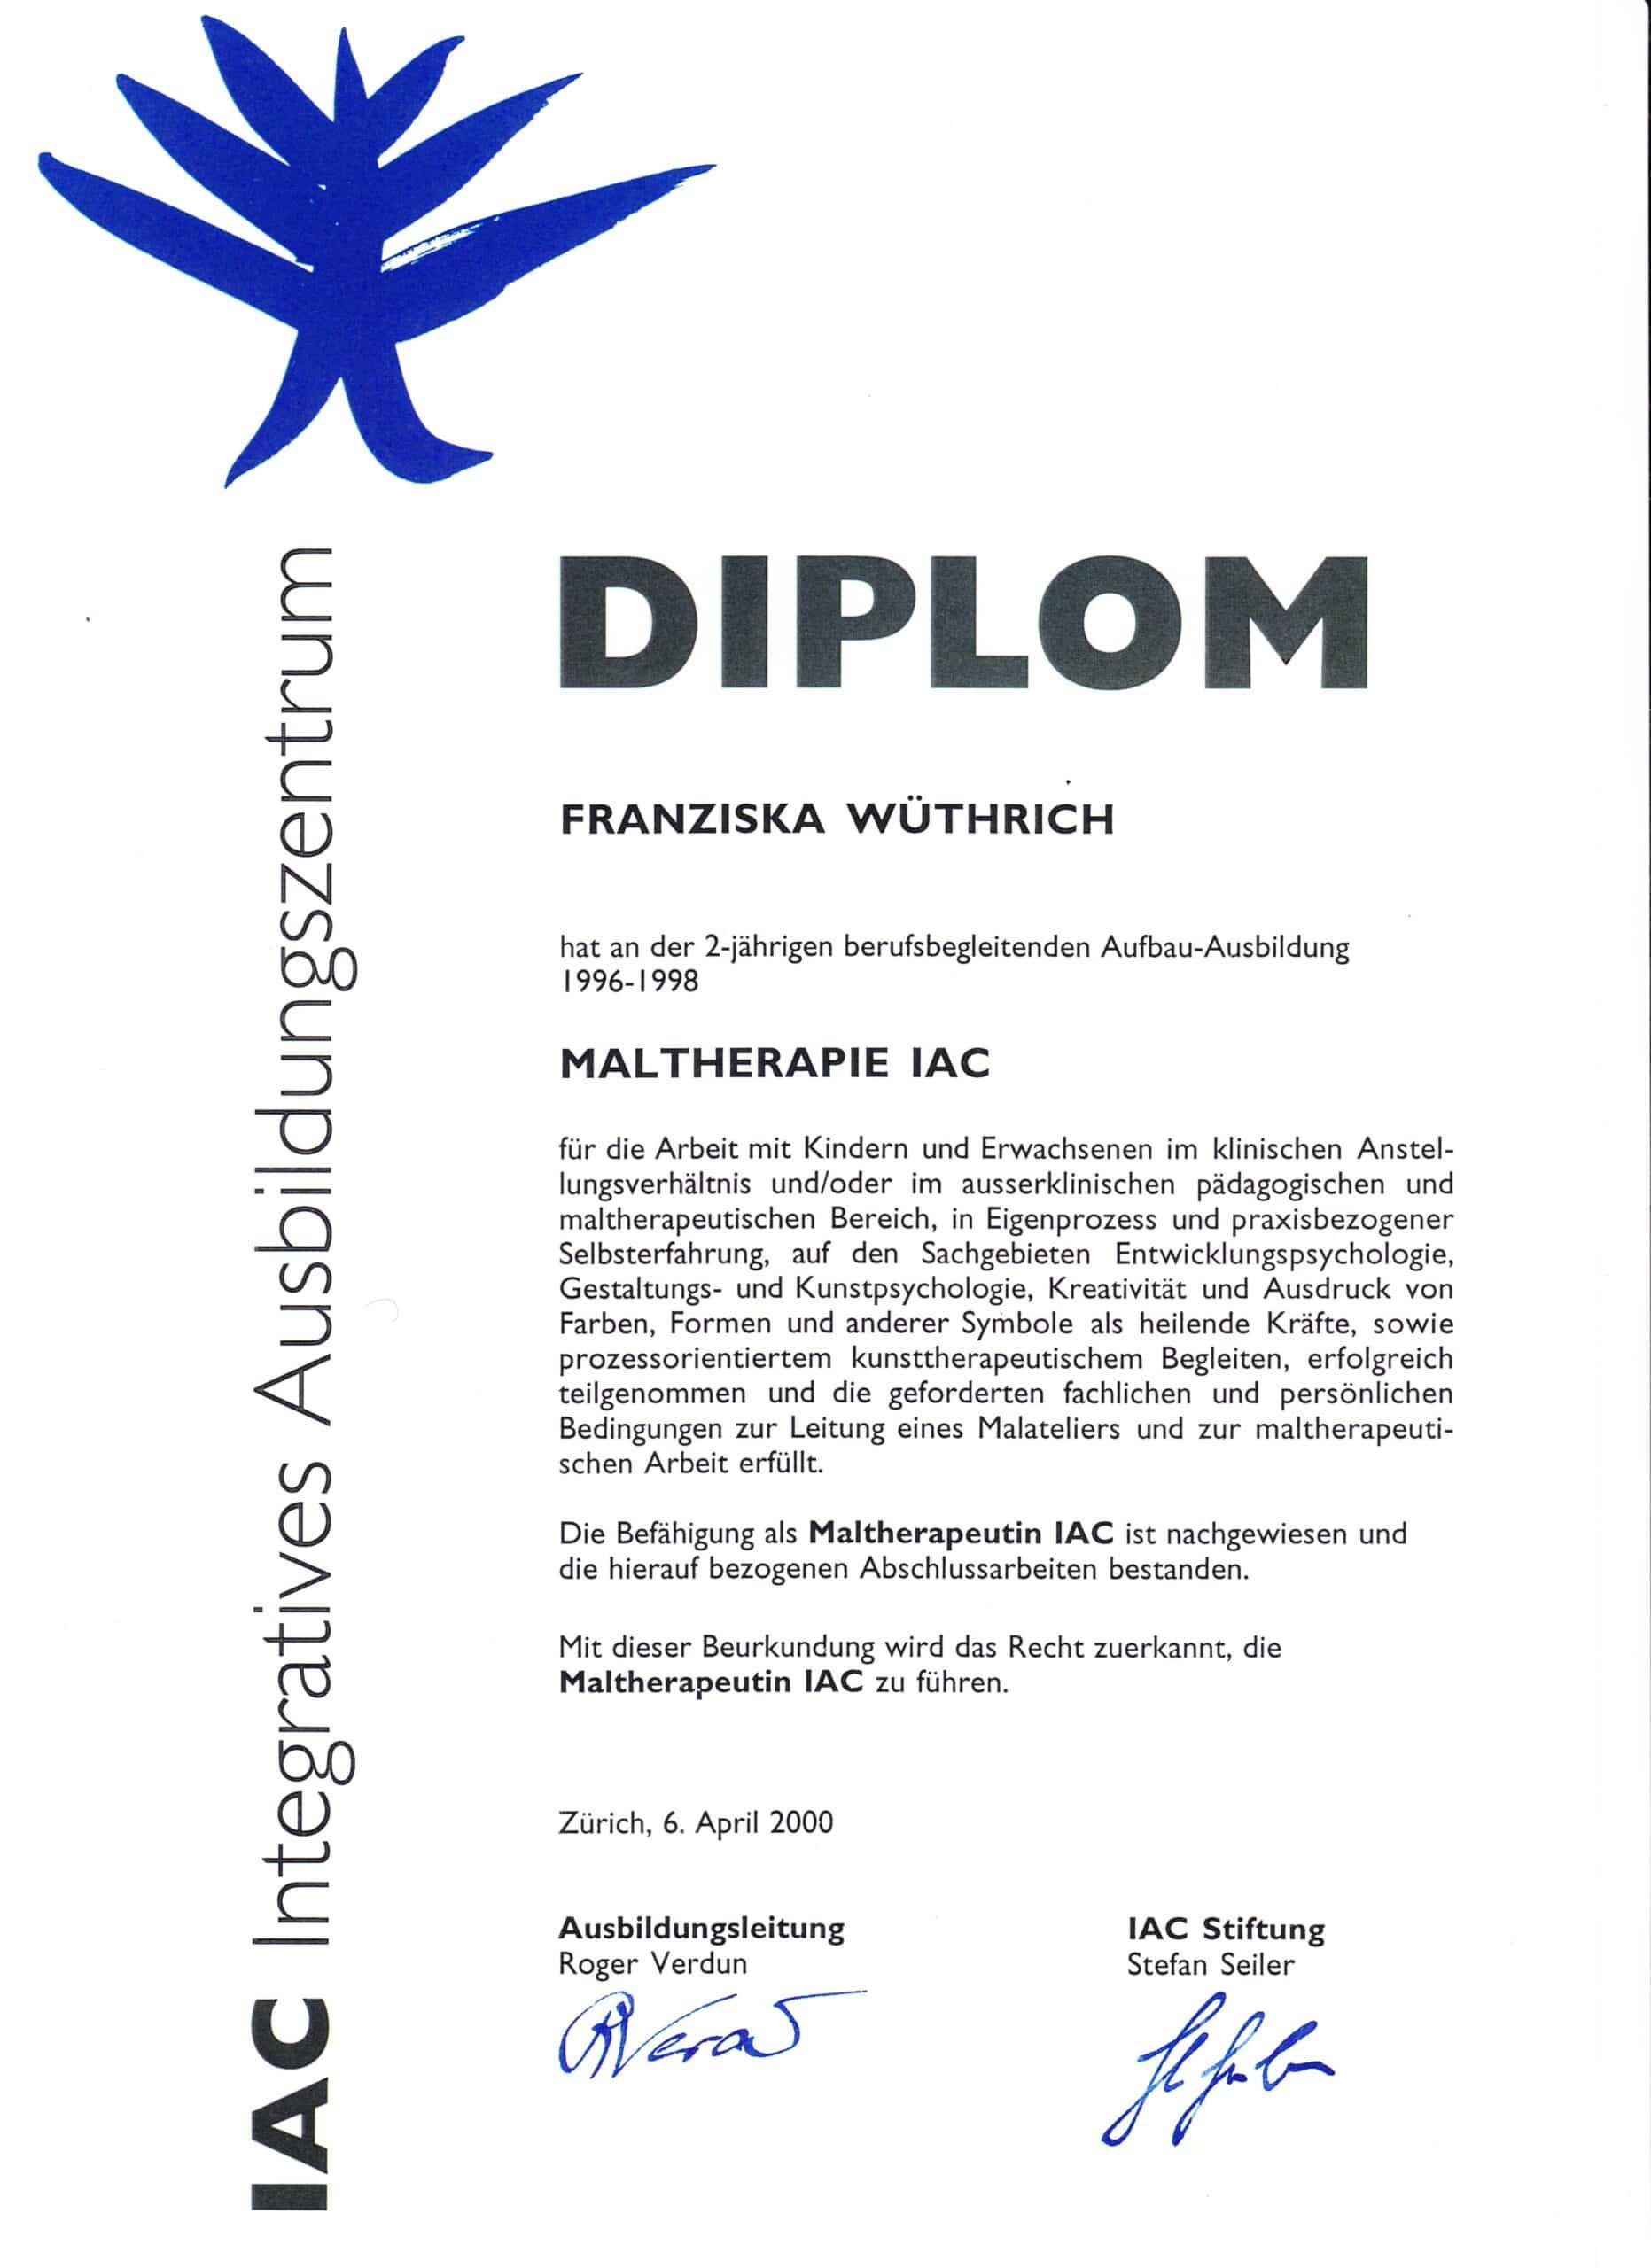 Diplom Malterhapie